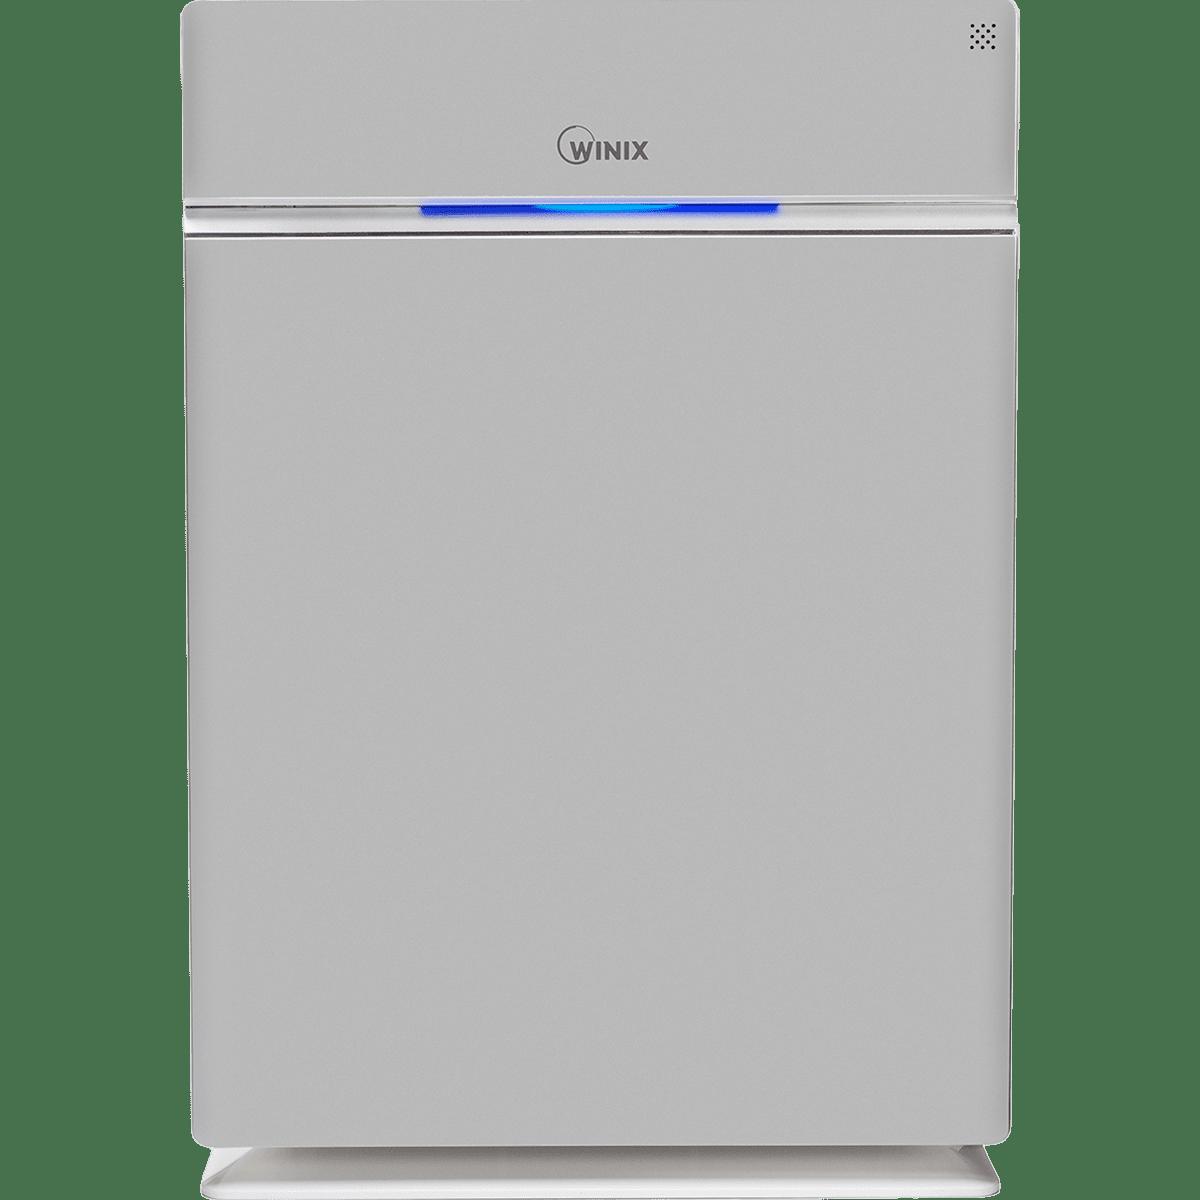 Winix HR1000 PlasmaWave True HEPA Wifi-Connected Smart Air Purifier wi5431